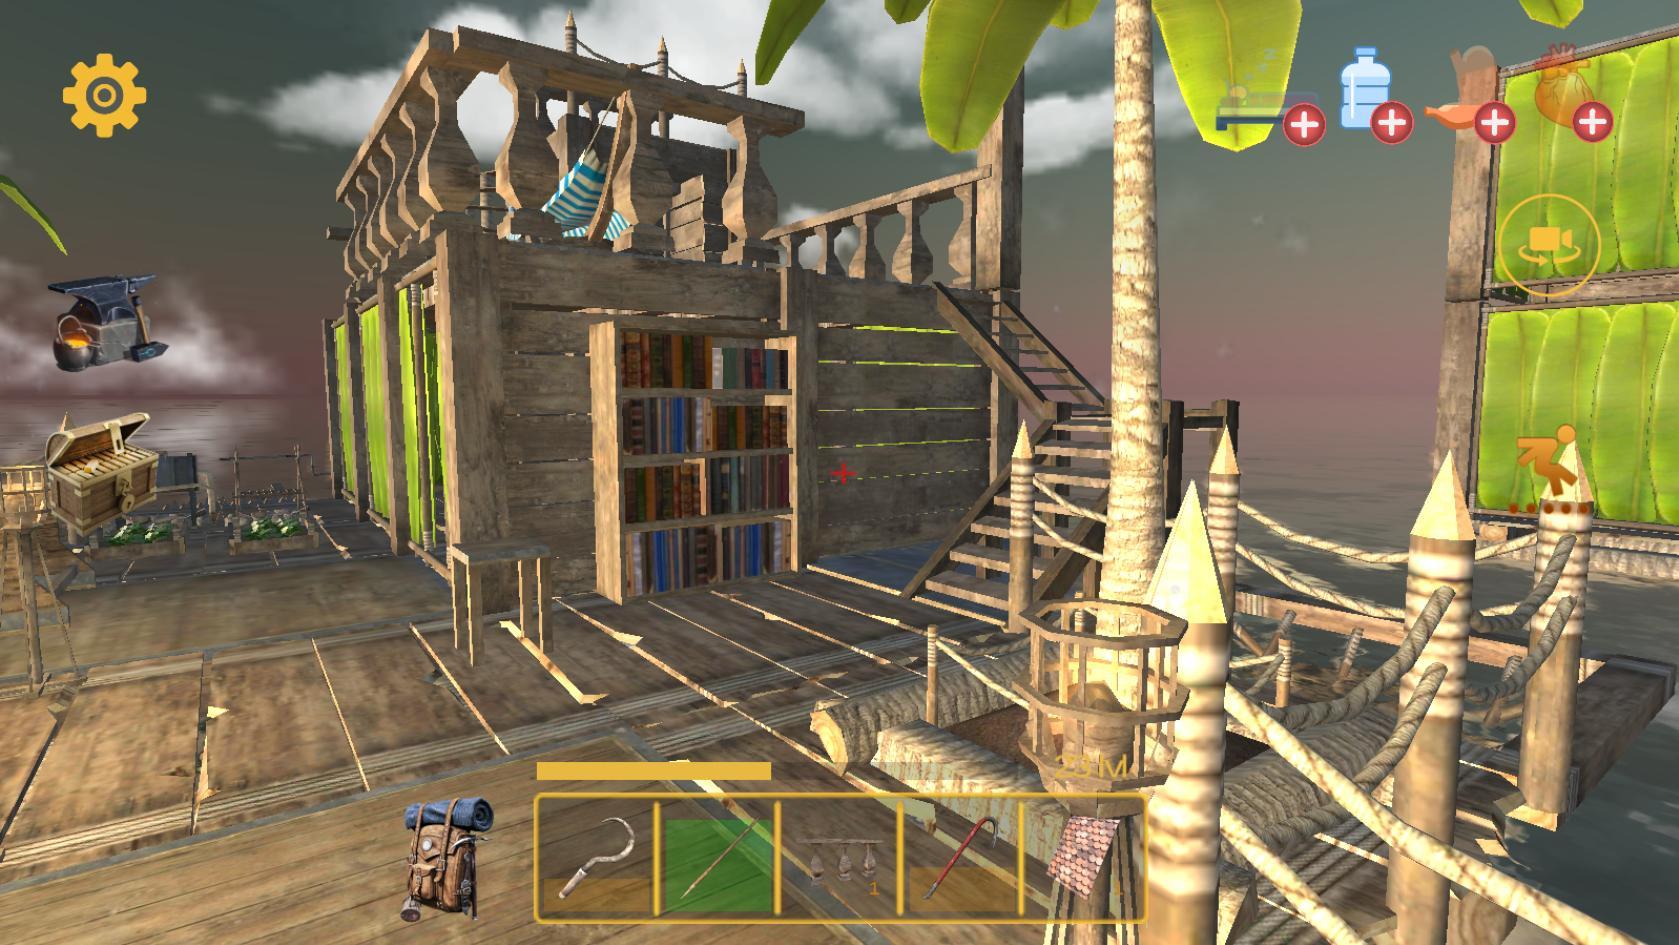 Mendonlot game Raft Survival: Multiplayer